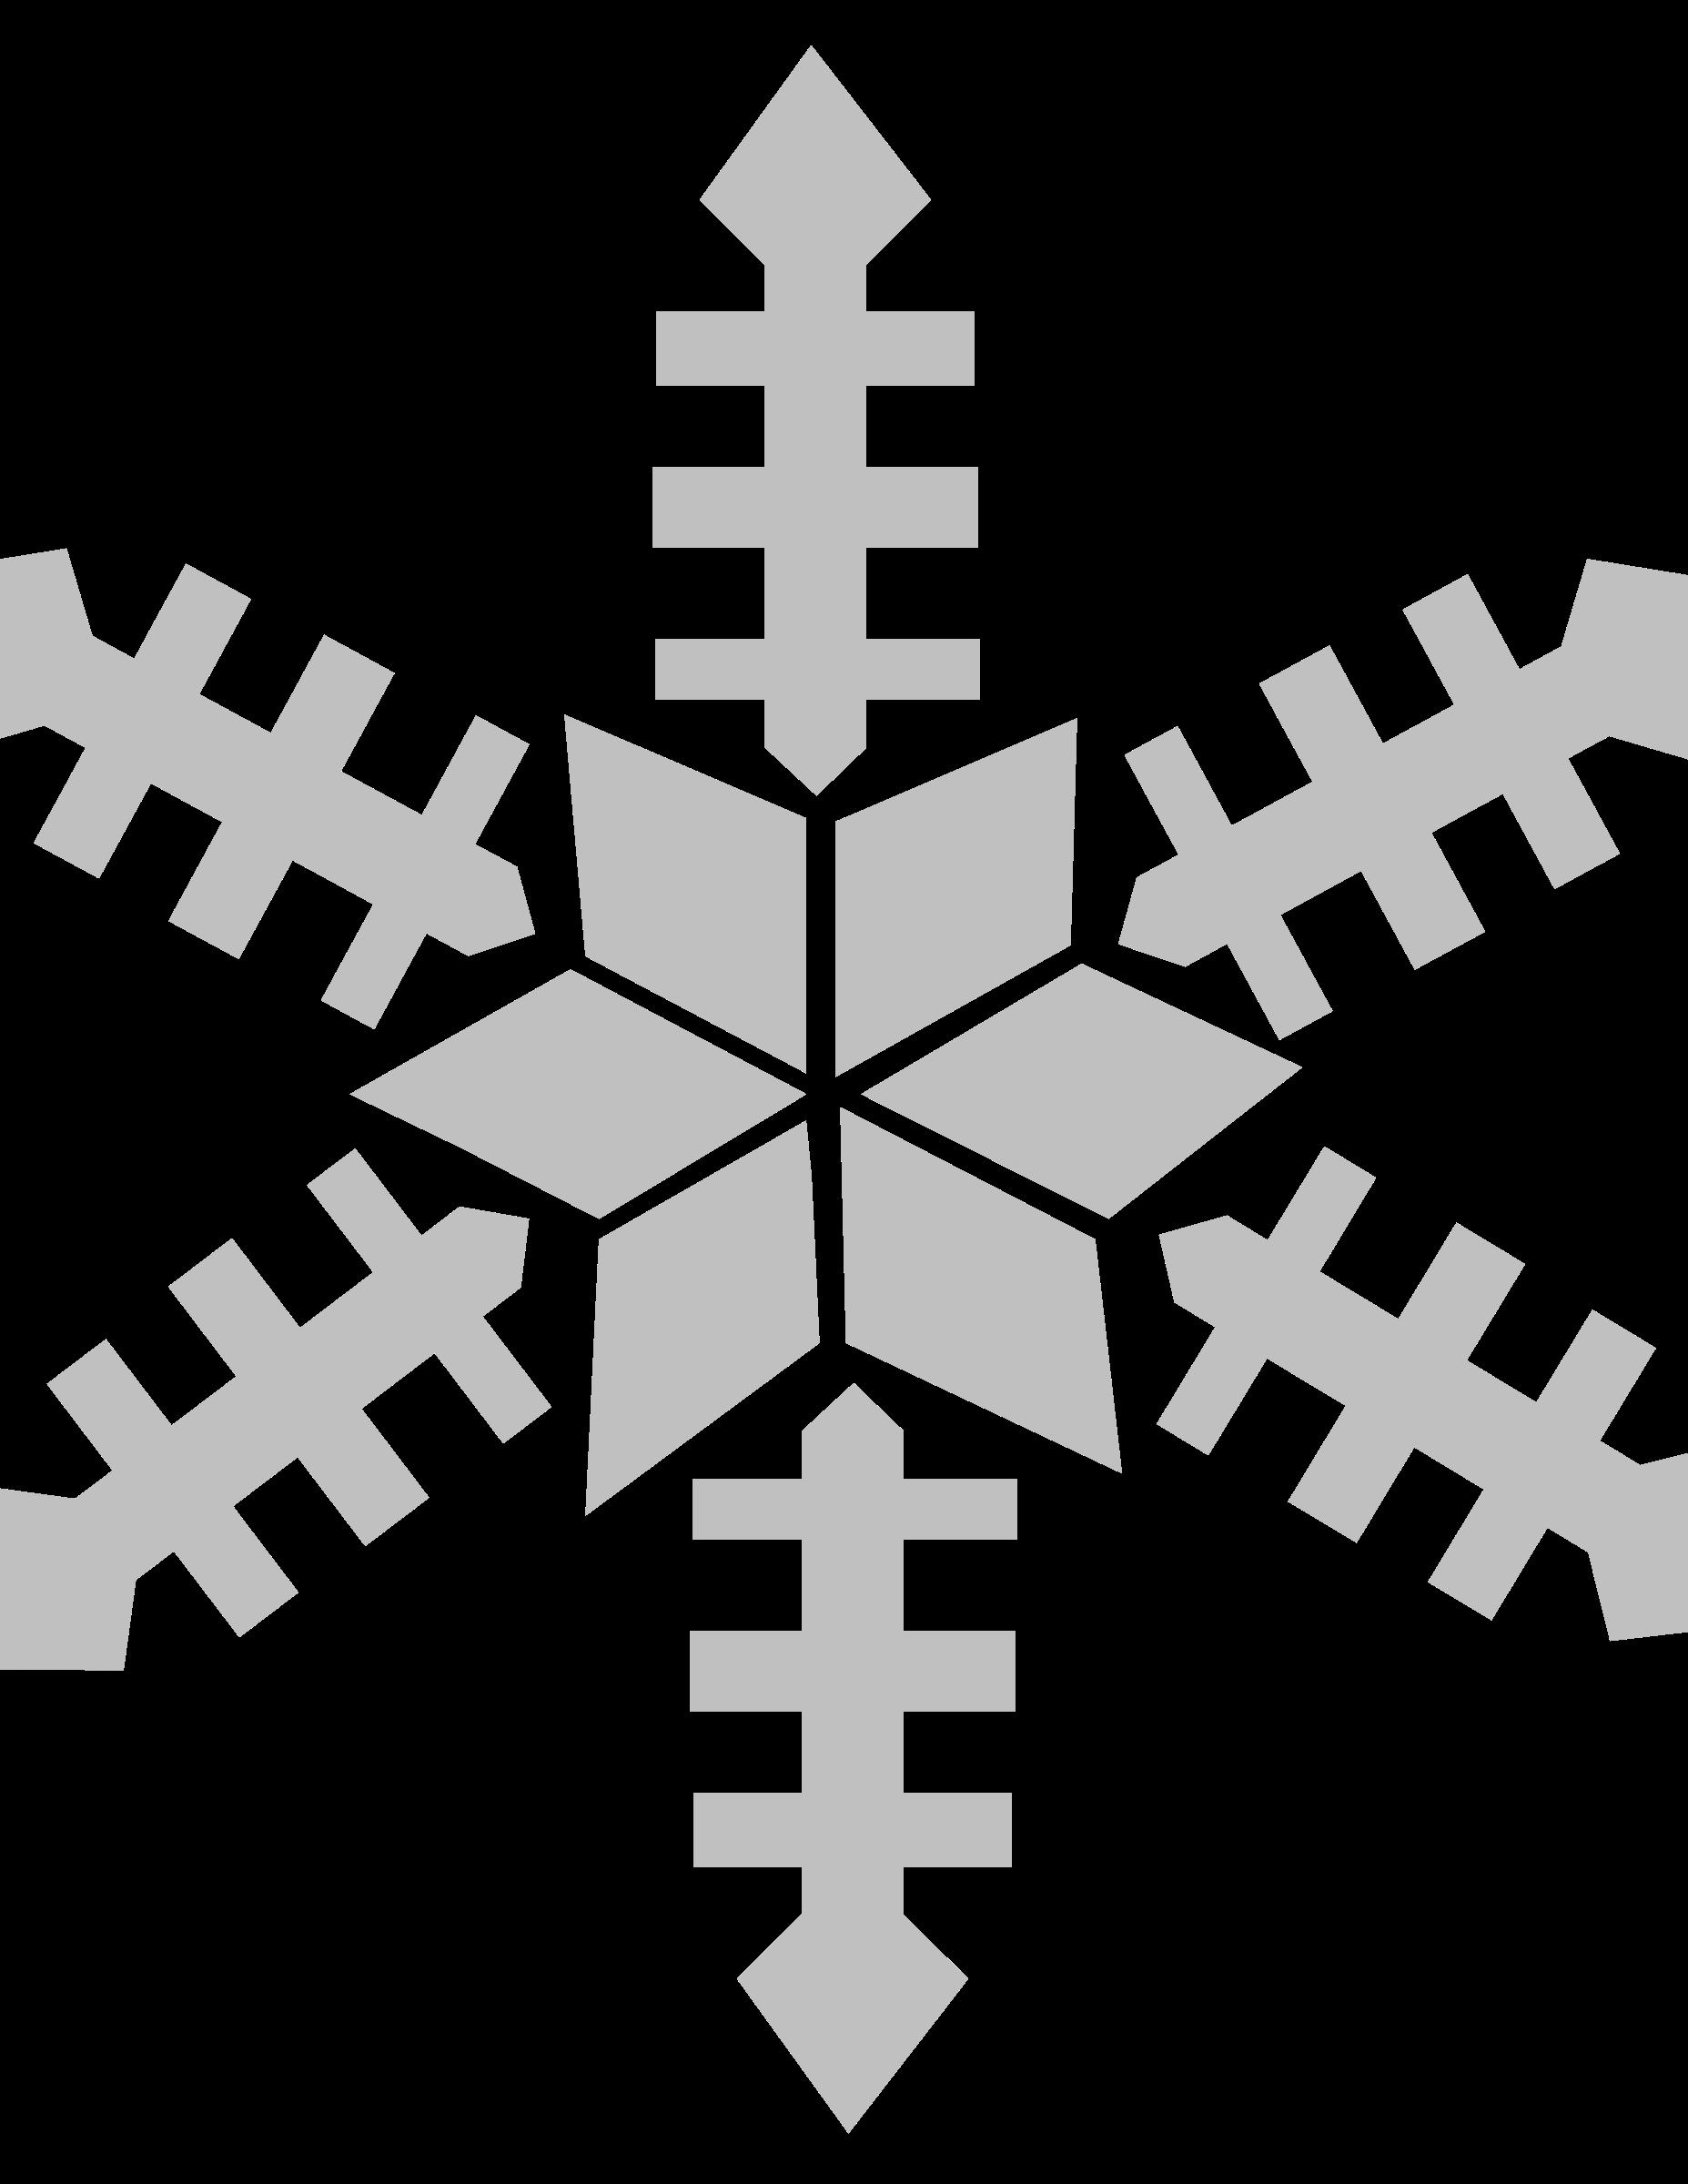 Snowflake cross clipart banner transparent stock Clipart - snowflake banner transparent stock